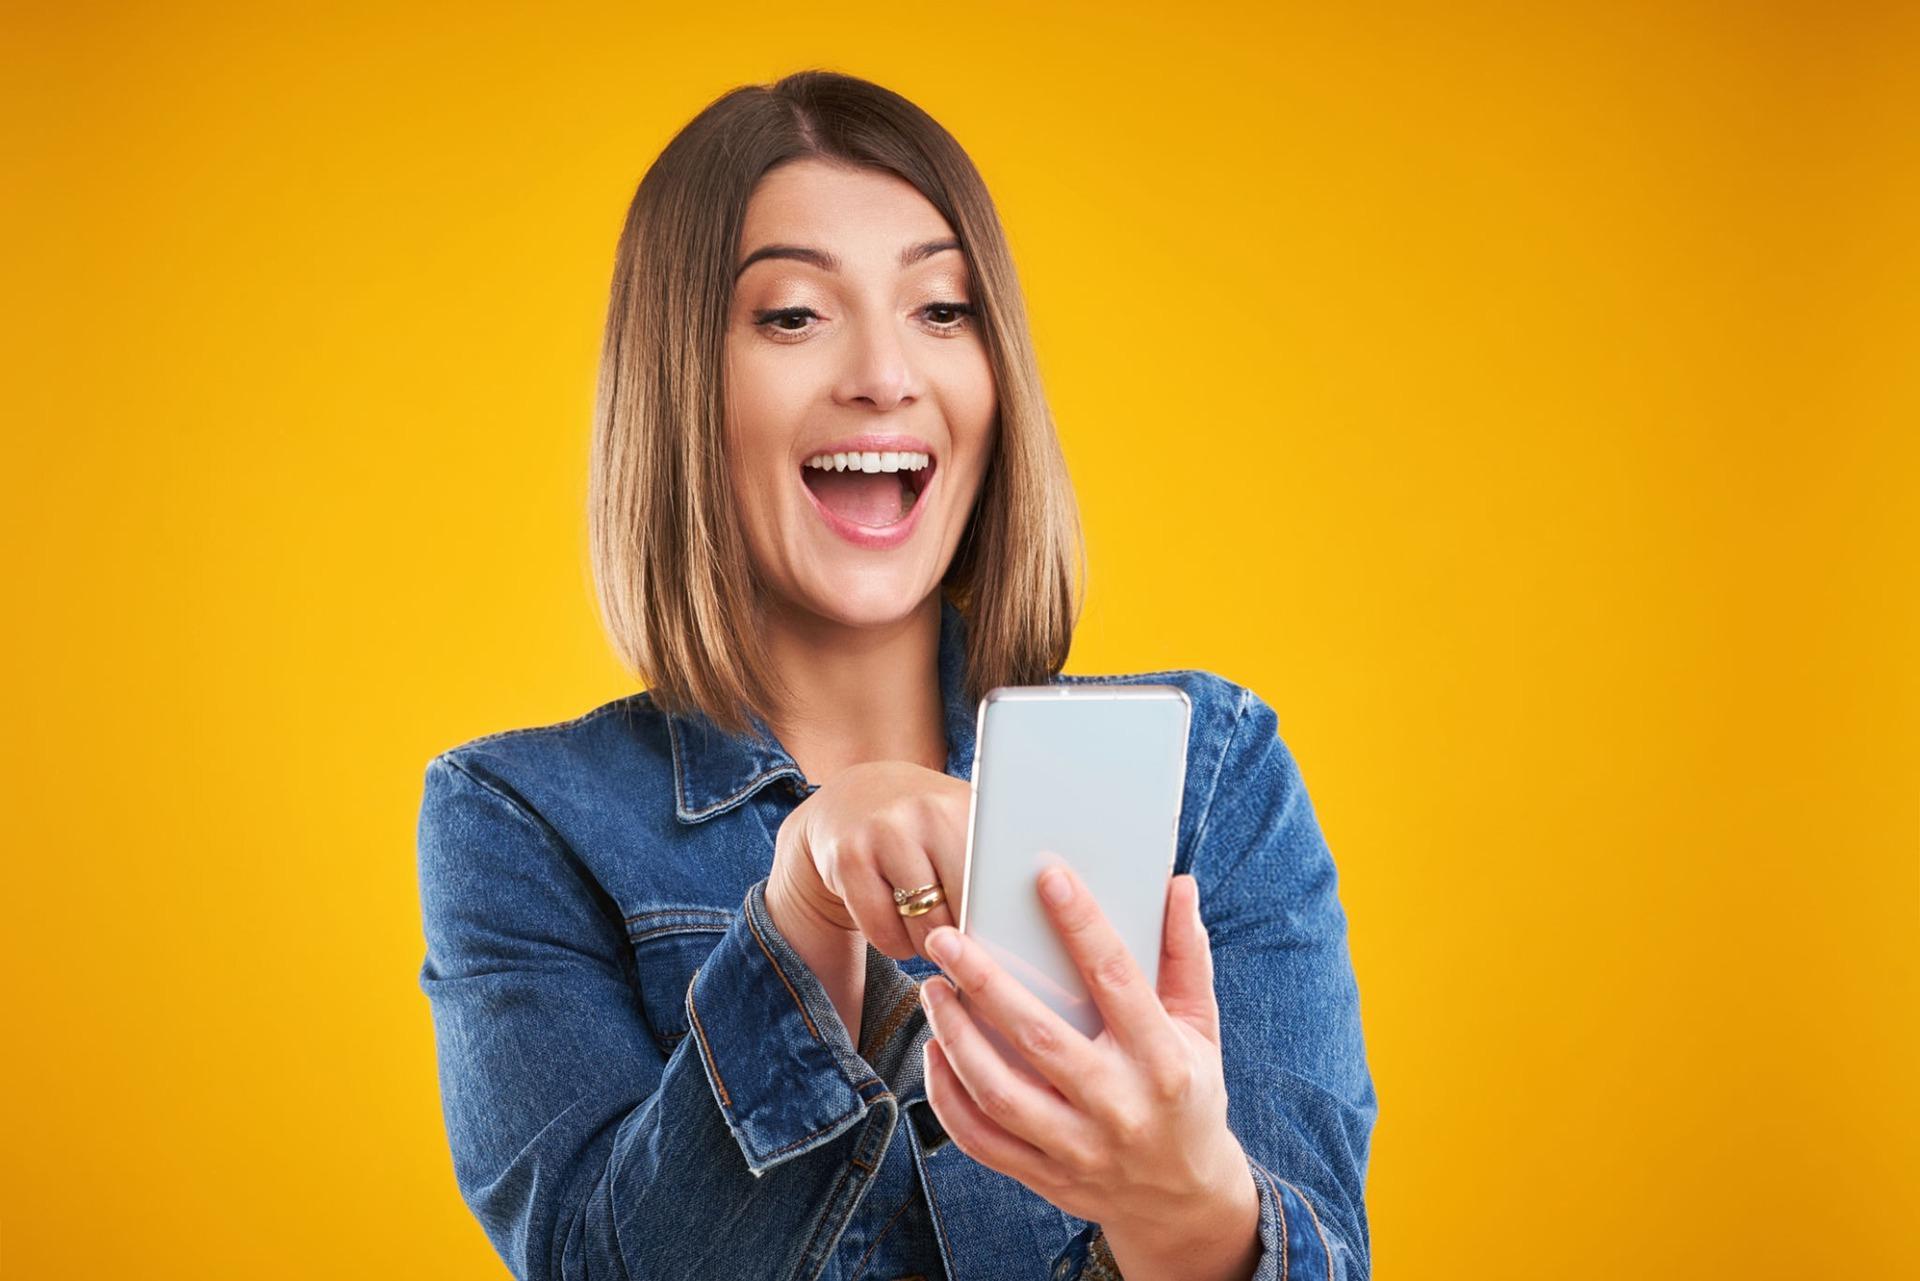 Яндекс.Маркет назвал самый популярный смартфон 2020 года